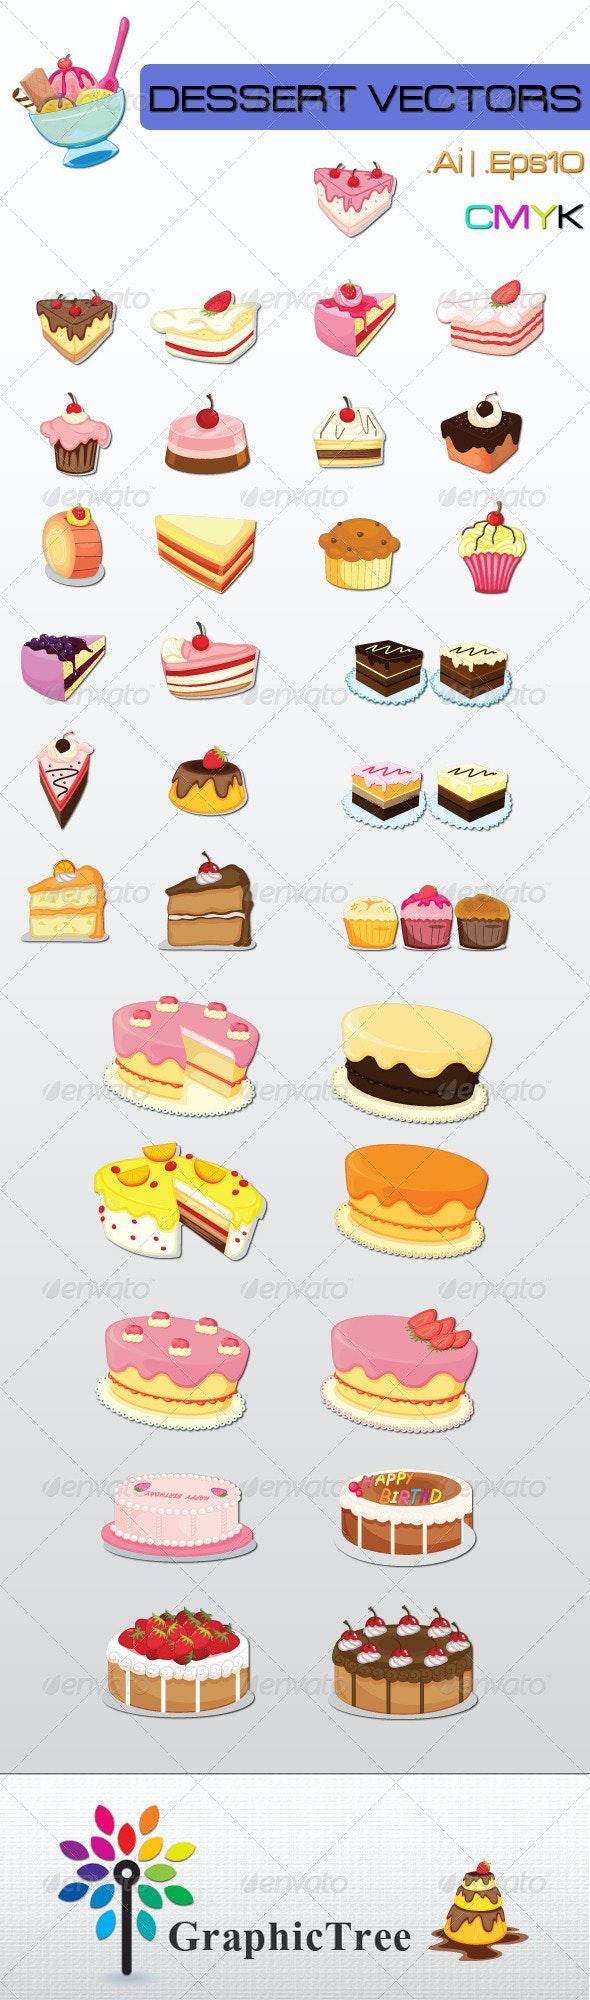 Dessert Vectors - Food Objects